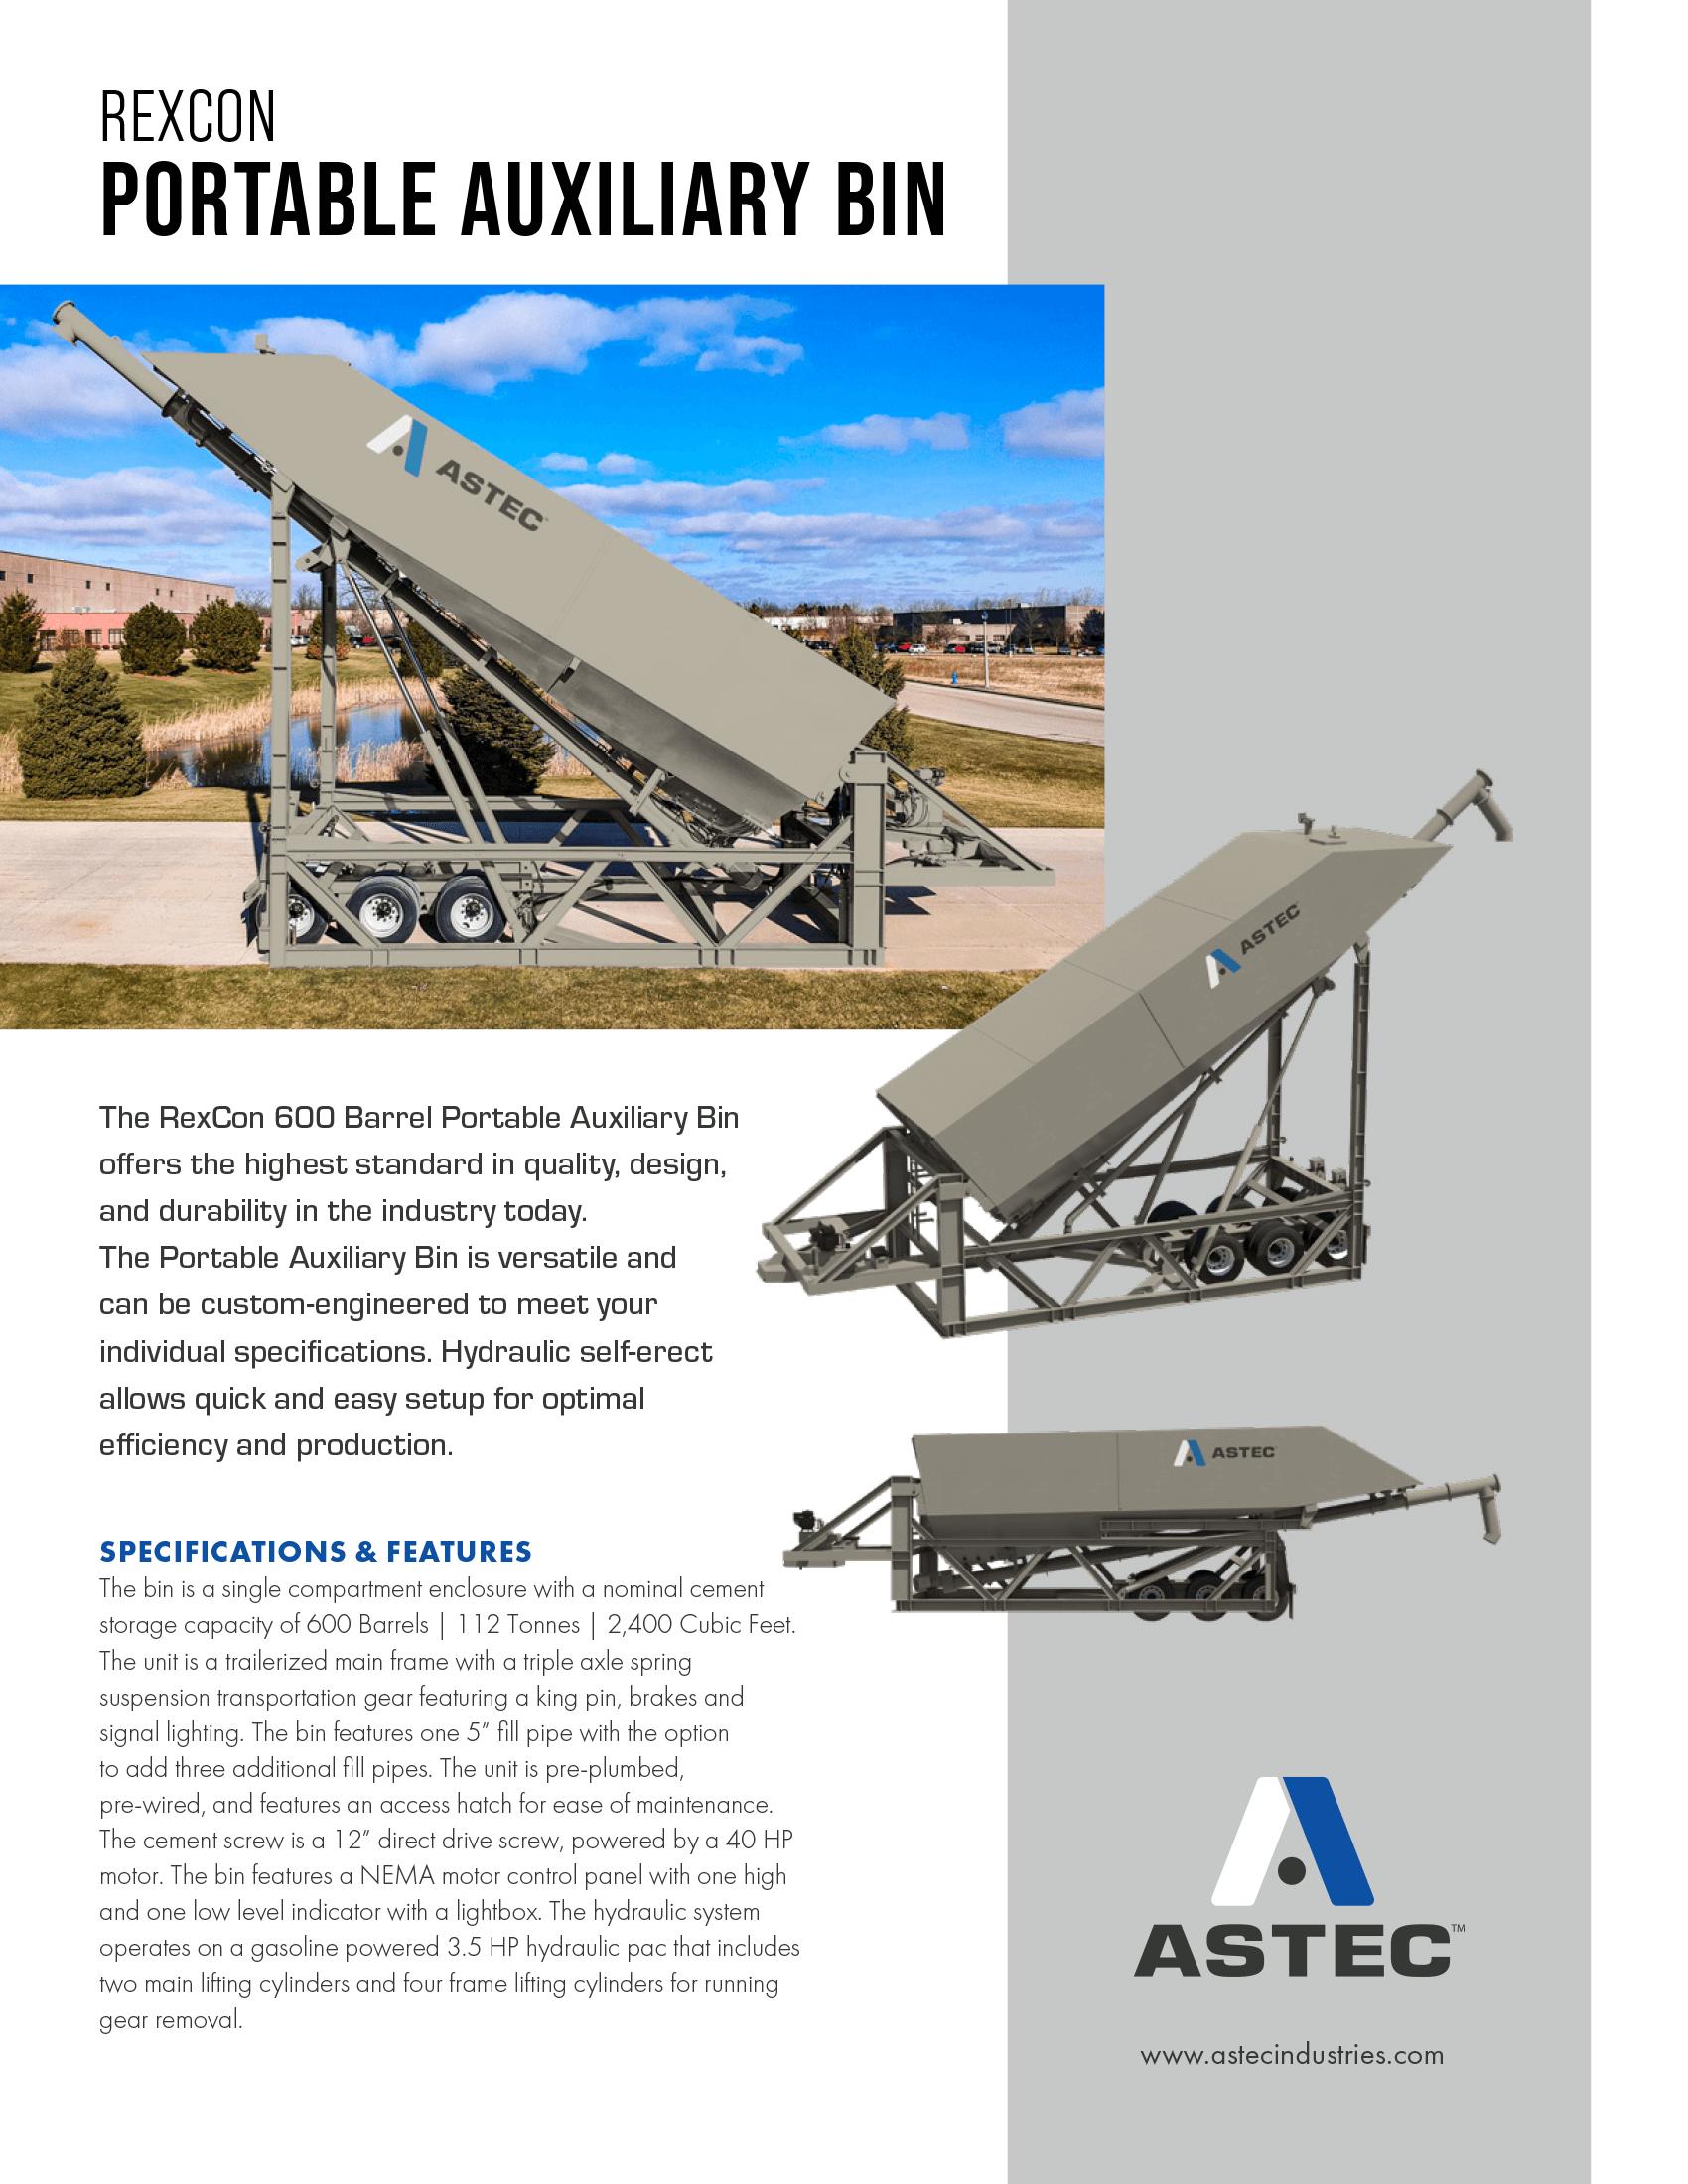 Astec RexCon 600 BBL SE Silo Concrete Sales Sheet